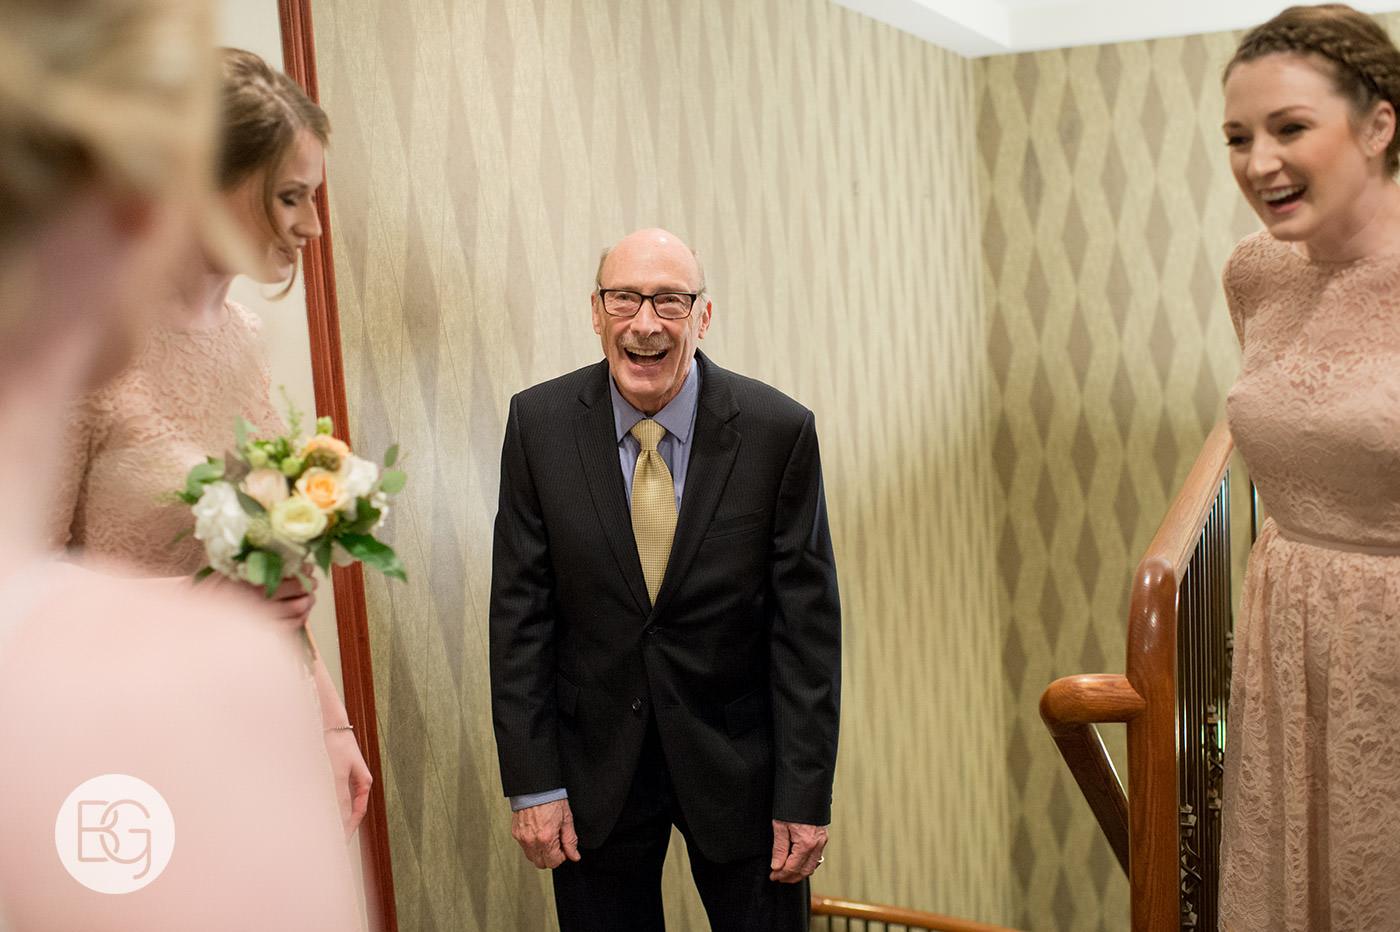 Edmonton_wedding_photographers_josh_sara_whyte_21.jpg